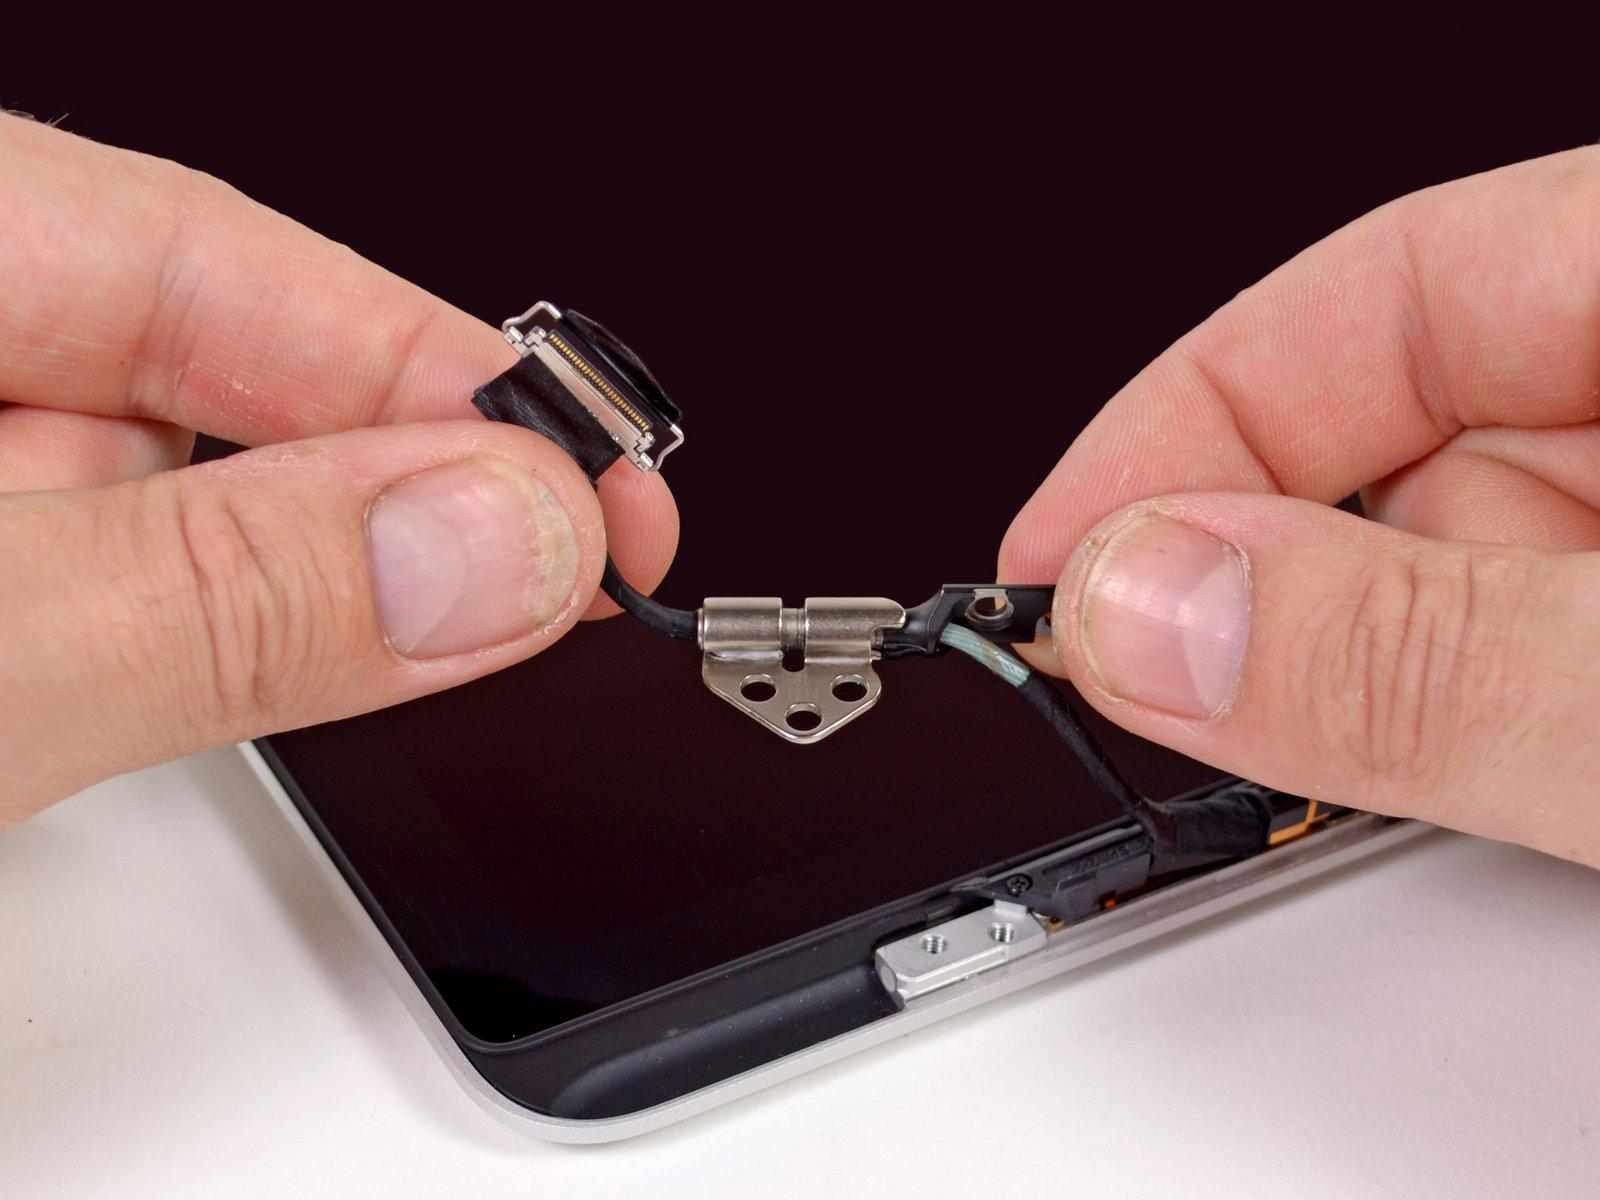 tighten macbook pro retina hinge dating